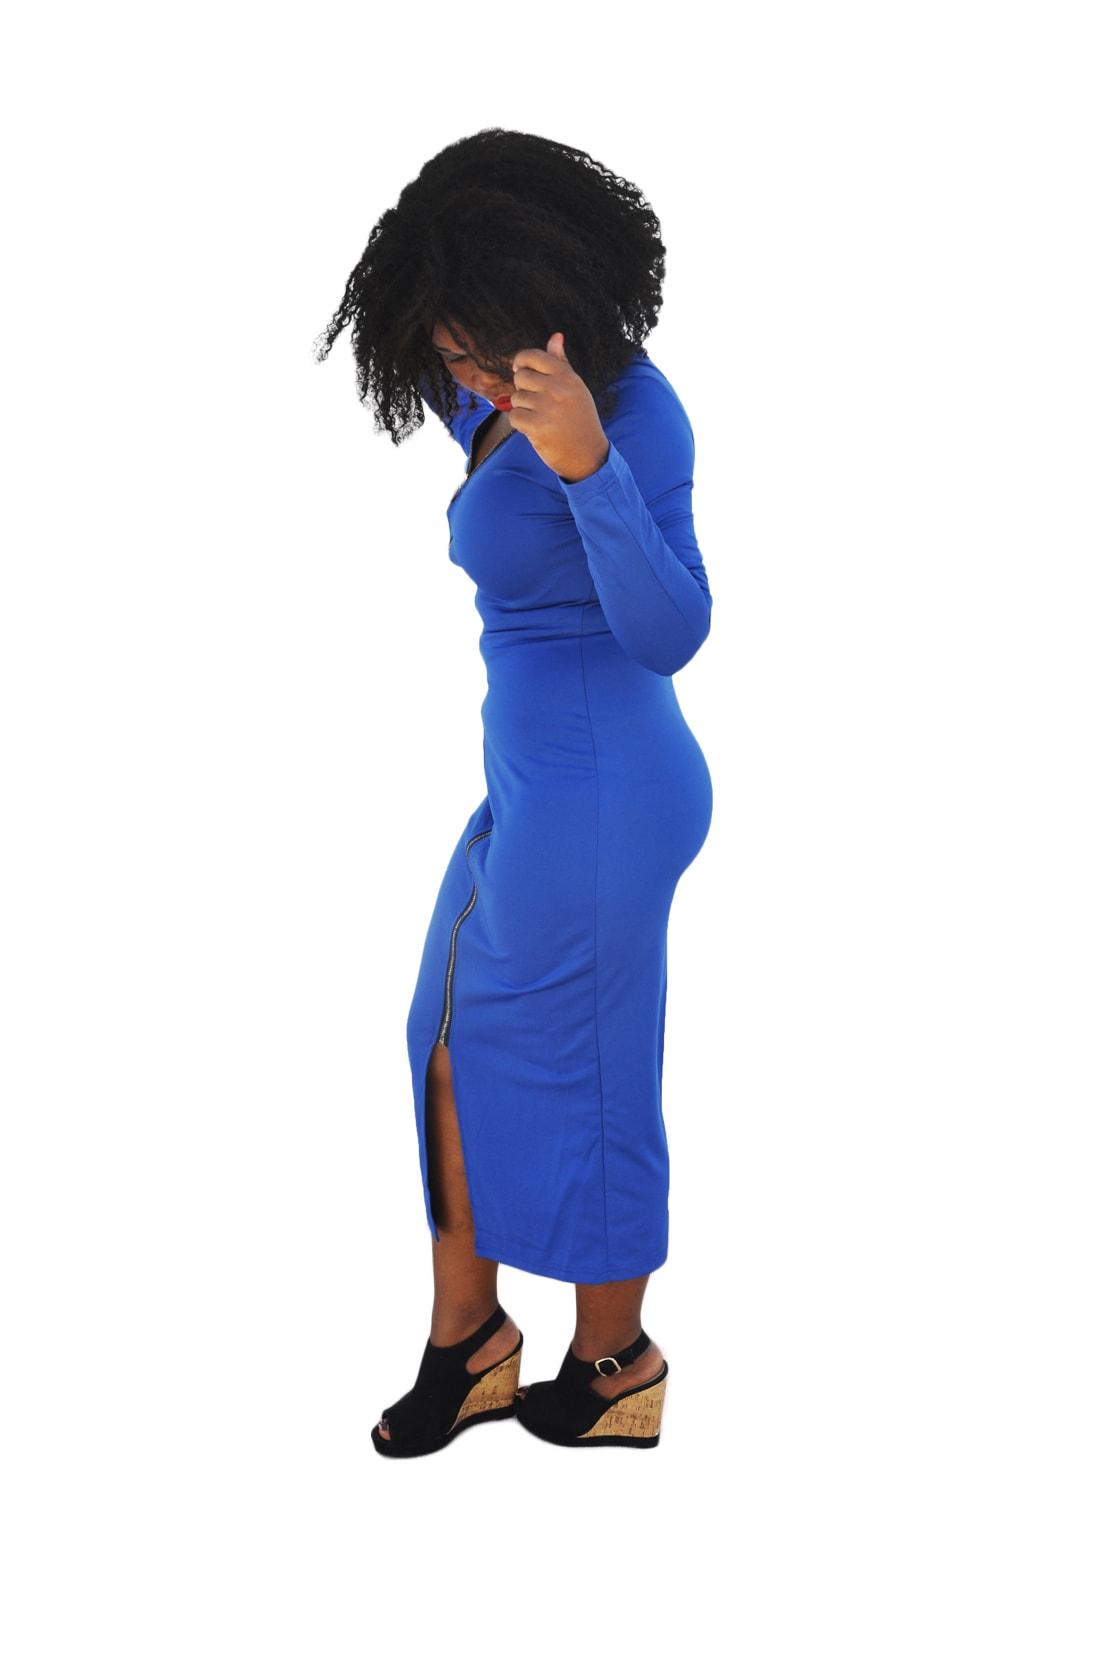 M0185 blue17 Office Evening Dresses maureens.com boutique